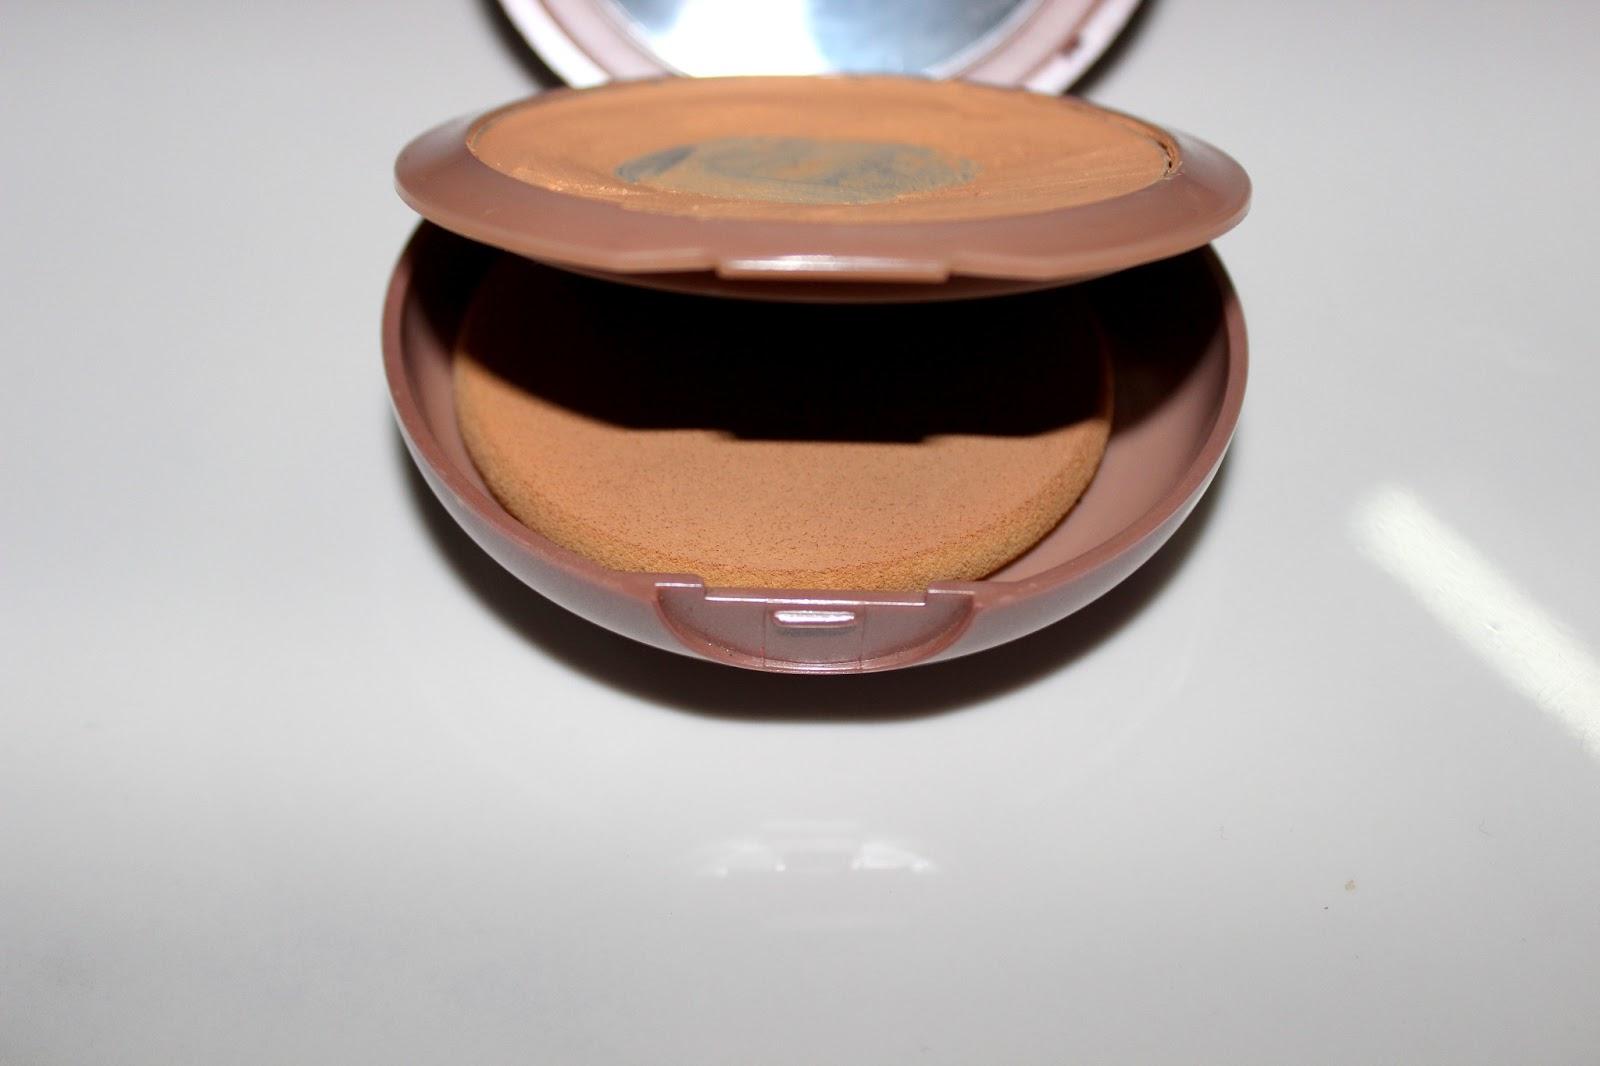 Backstage Eyeshadow Palette - Cool Neutrals by Dior #16